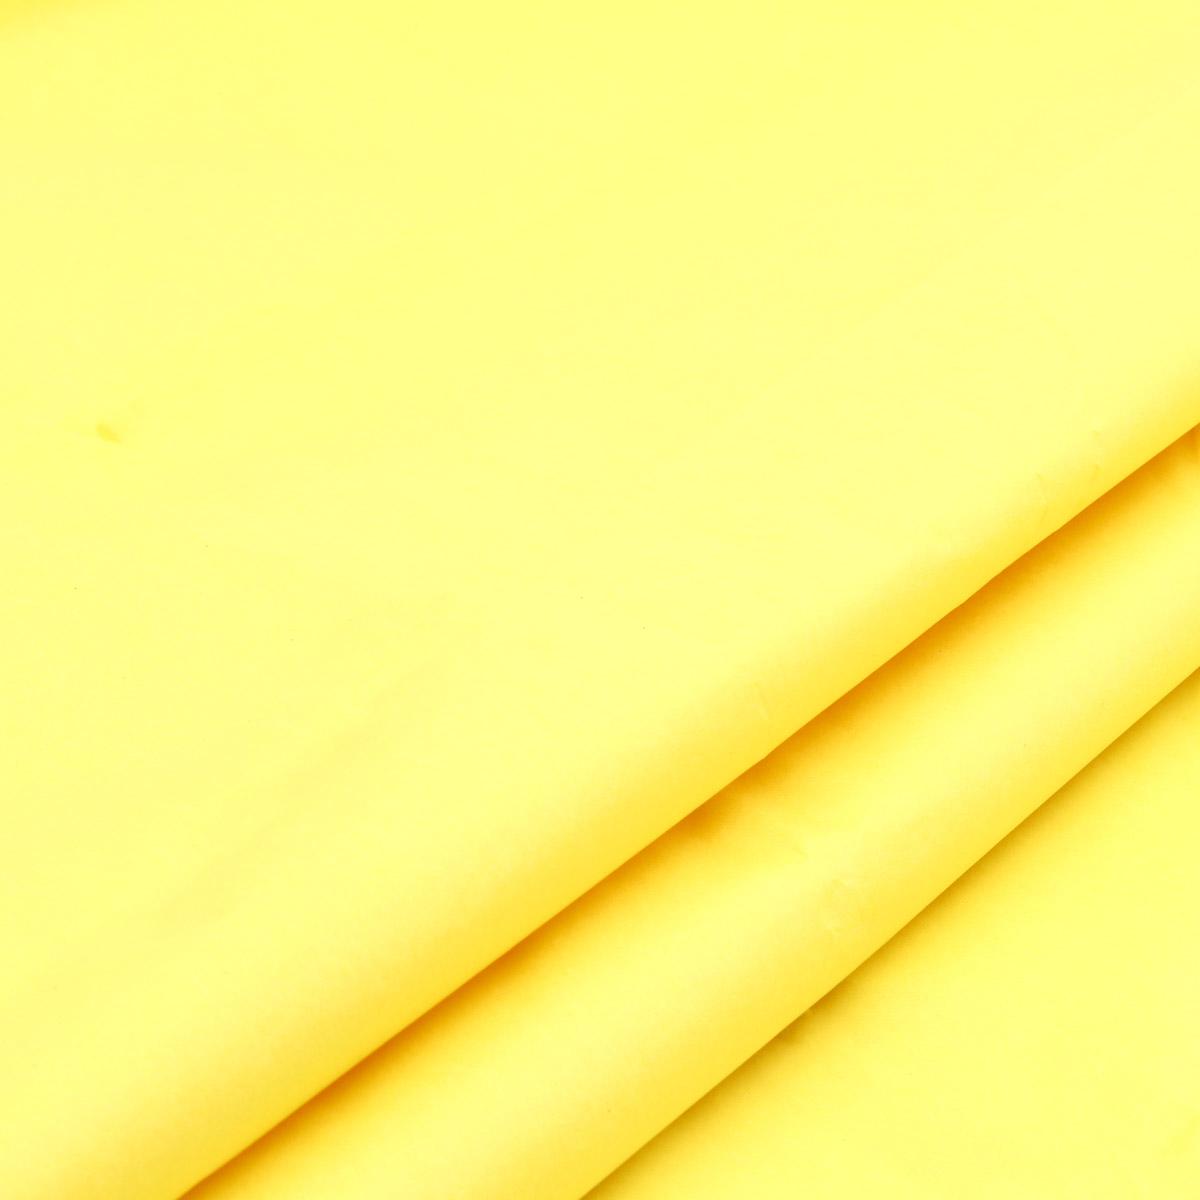 Бумага тишью Астра, 50*70см, 20гр/м, 5шт/упак